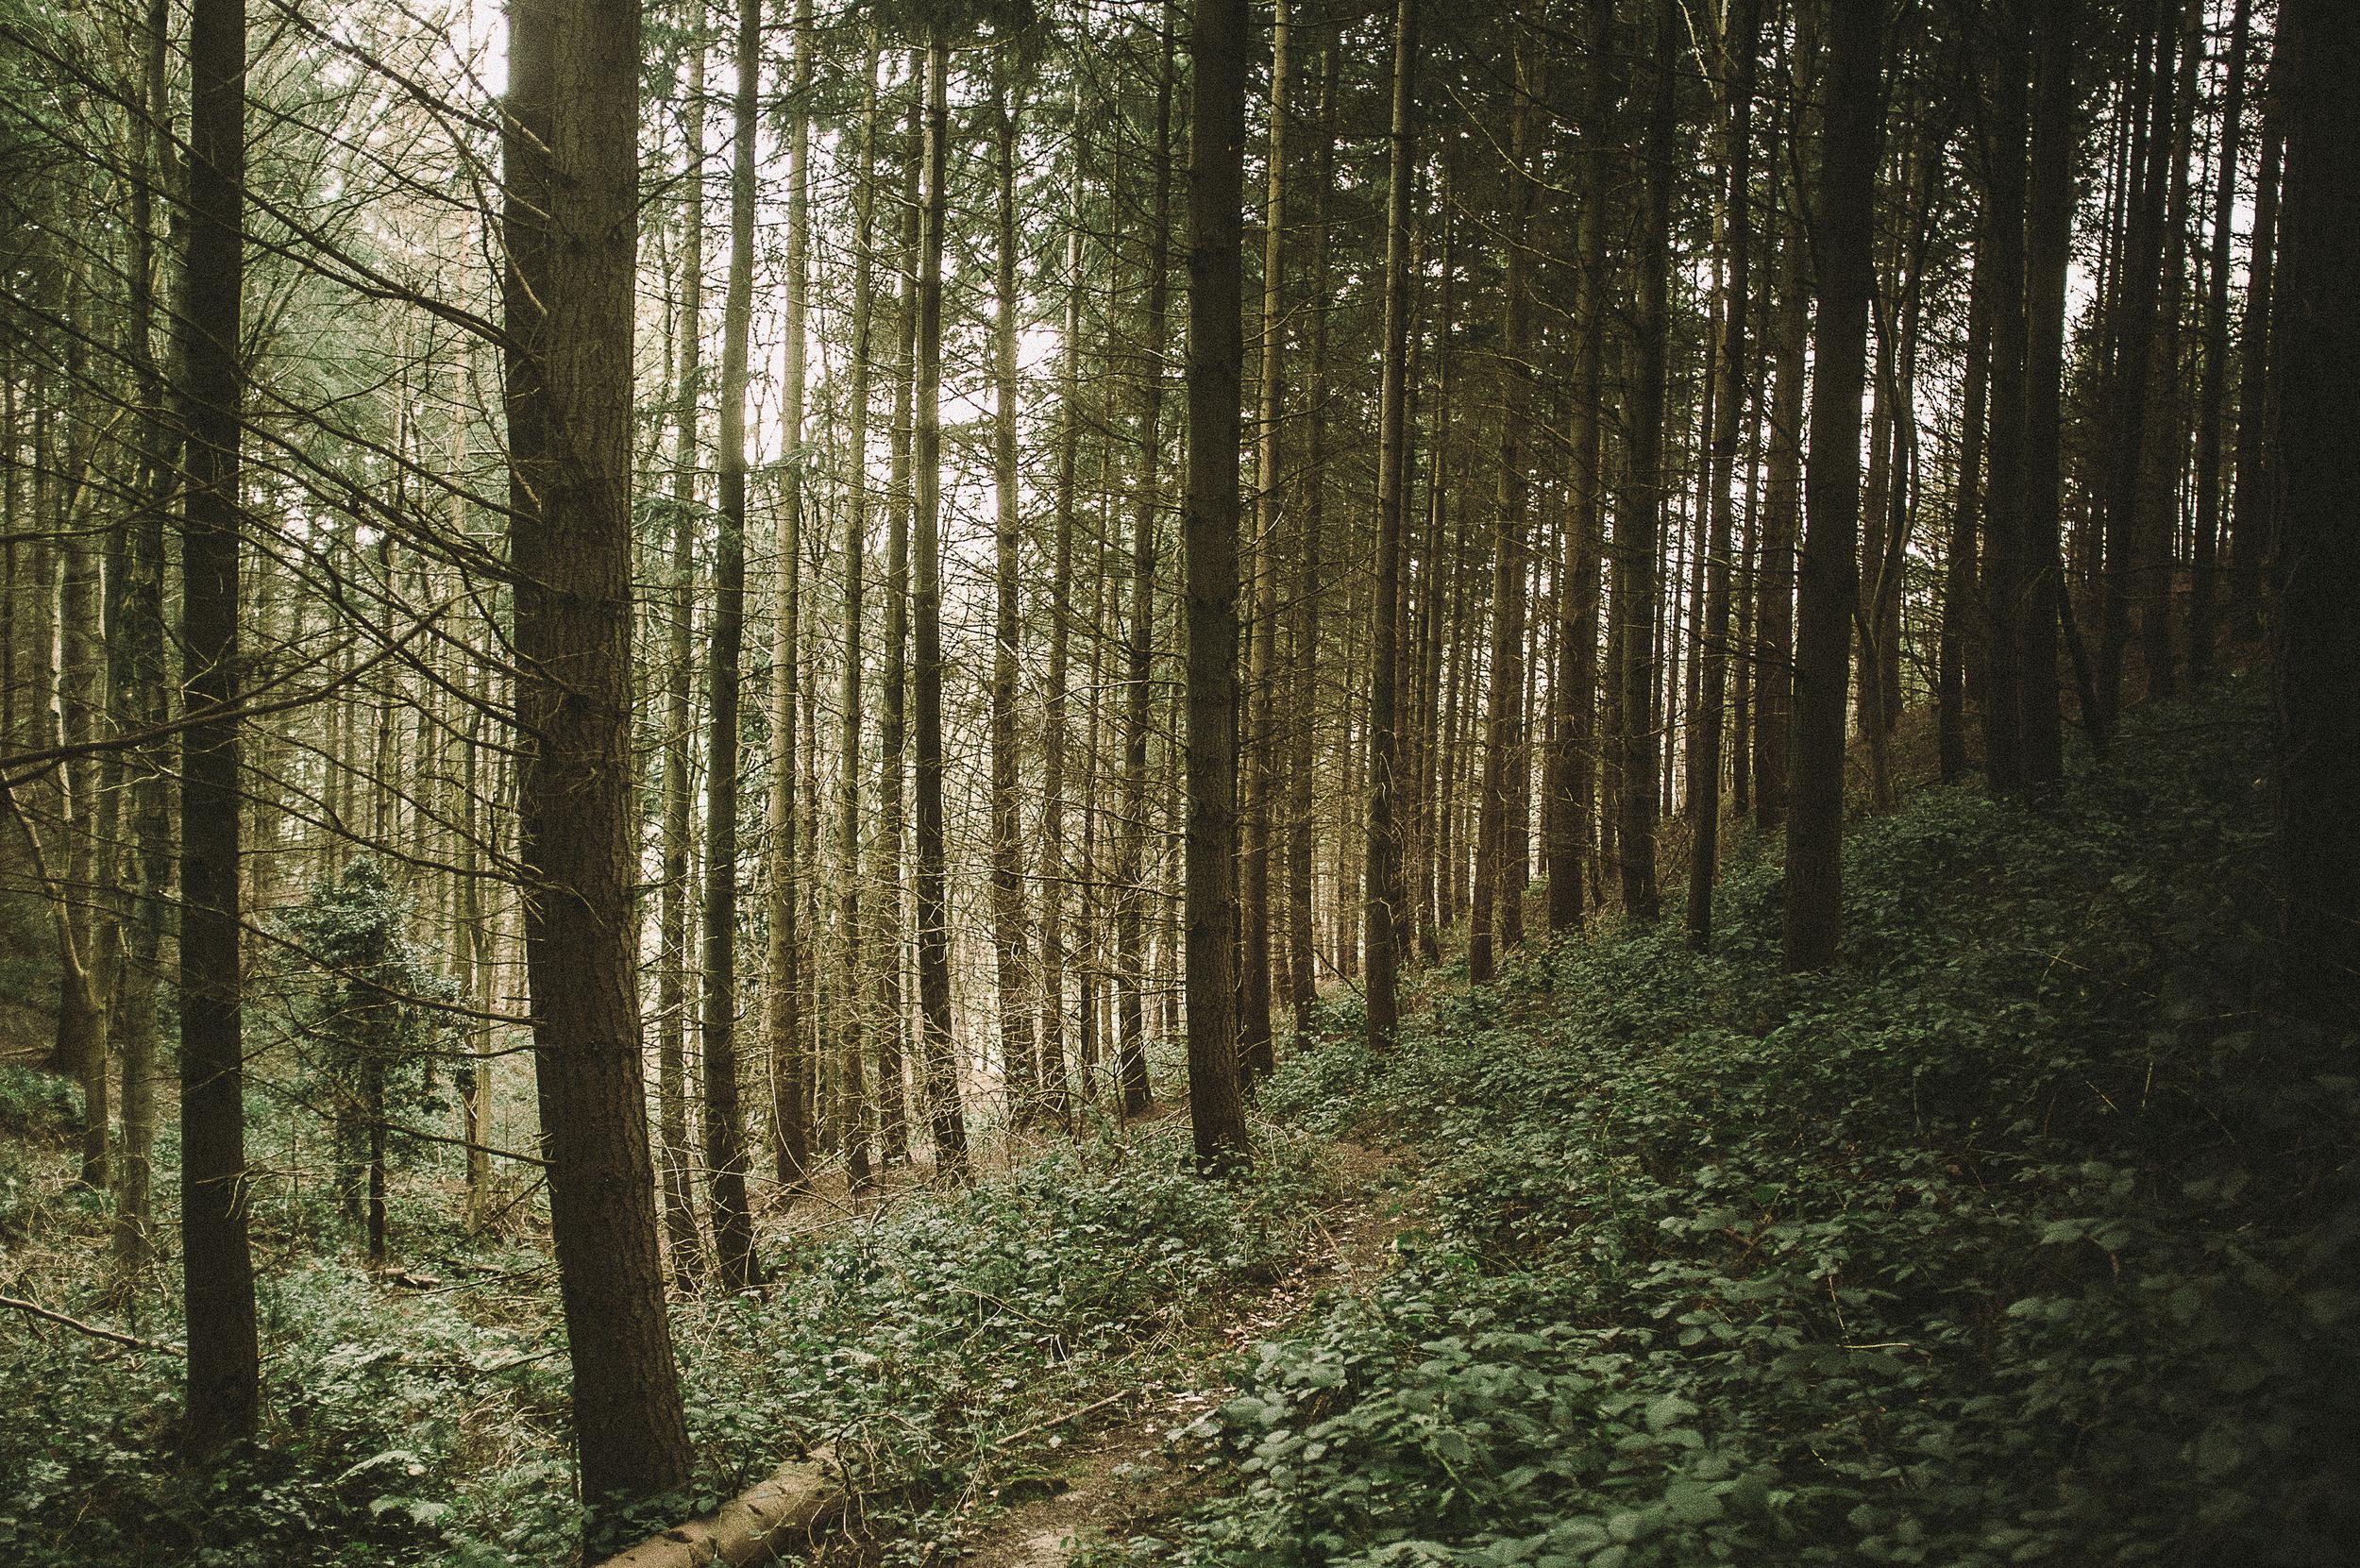 fuji x100 woods-1-15.jpg